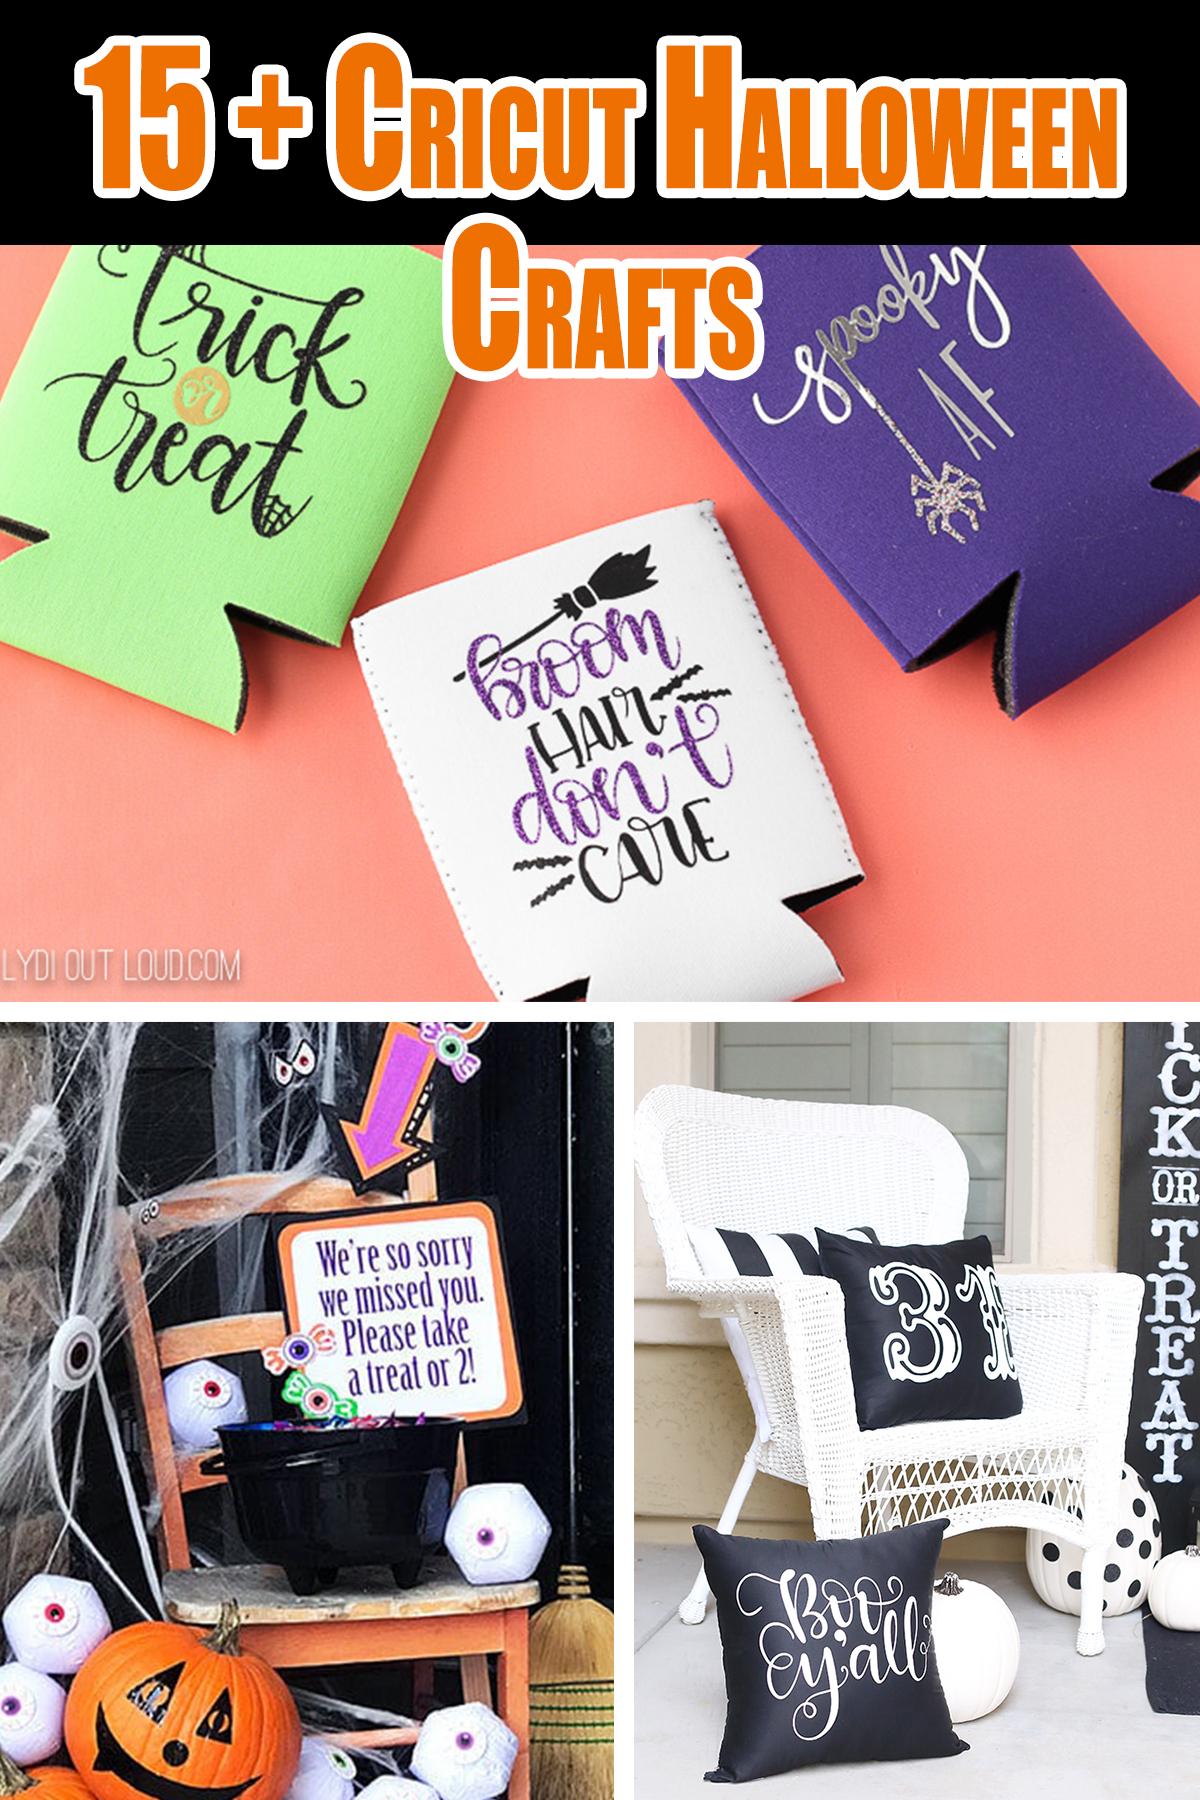 Cricut Crafts